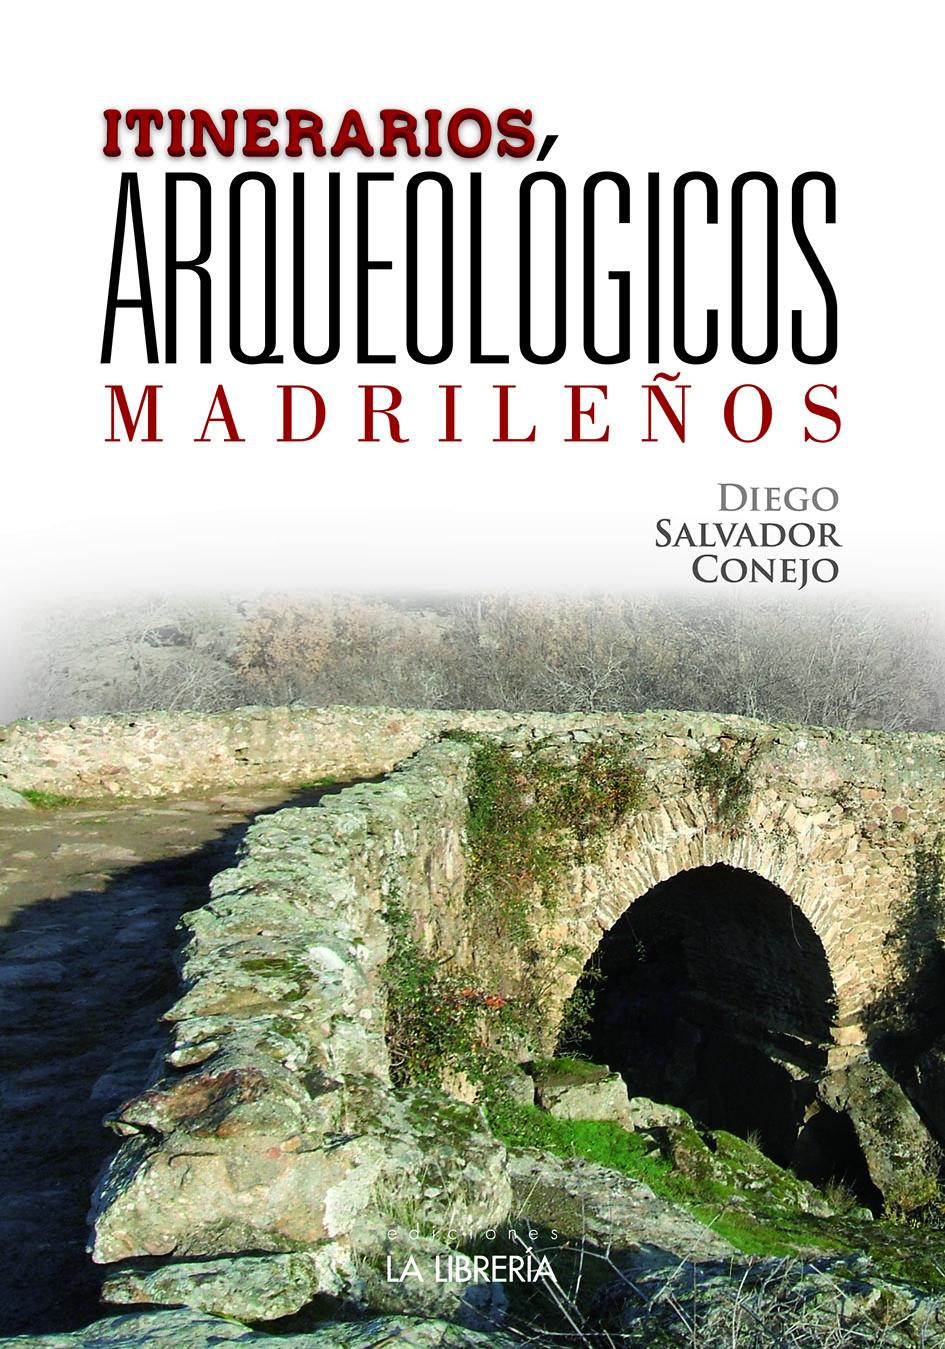 Itinerarios arqueológicos madrileños